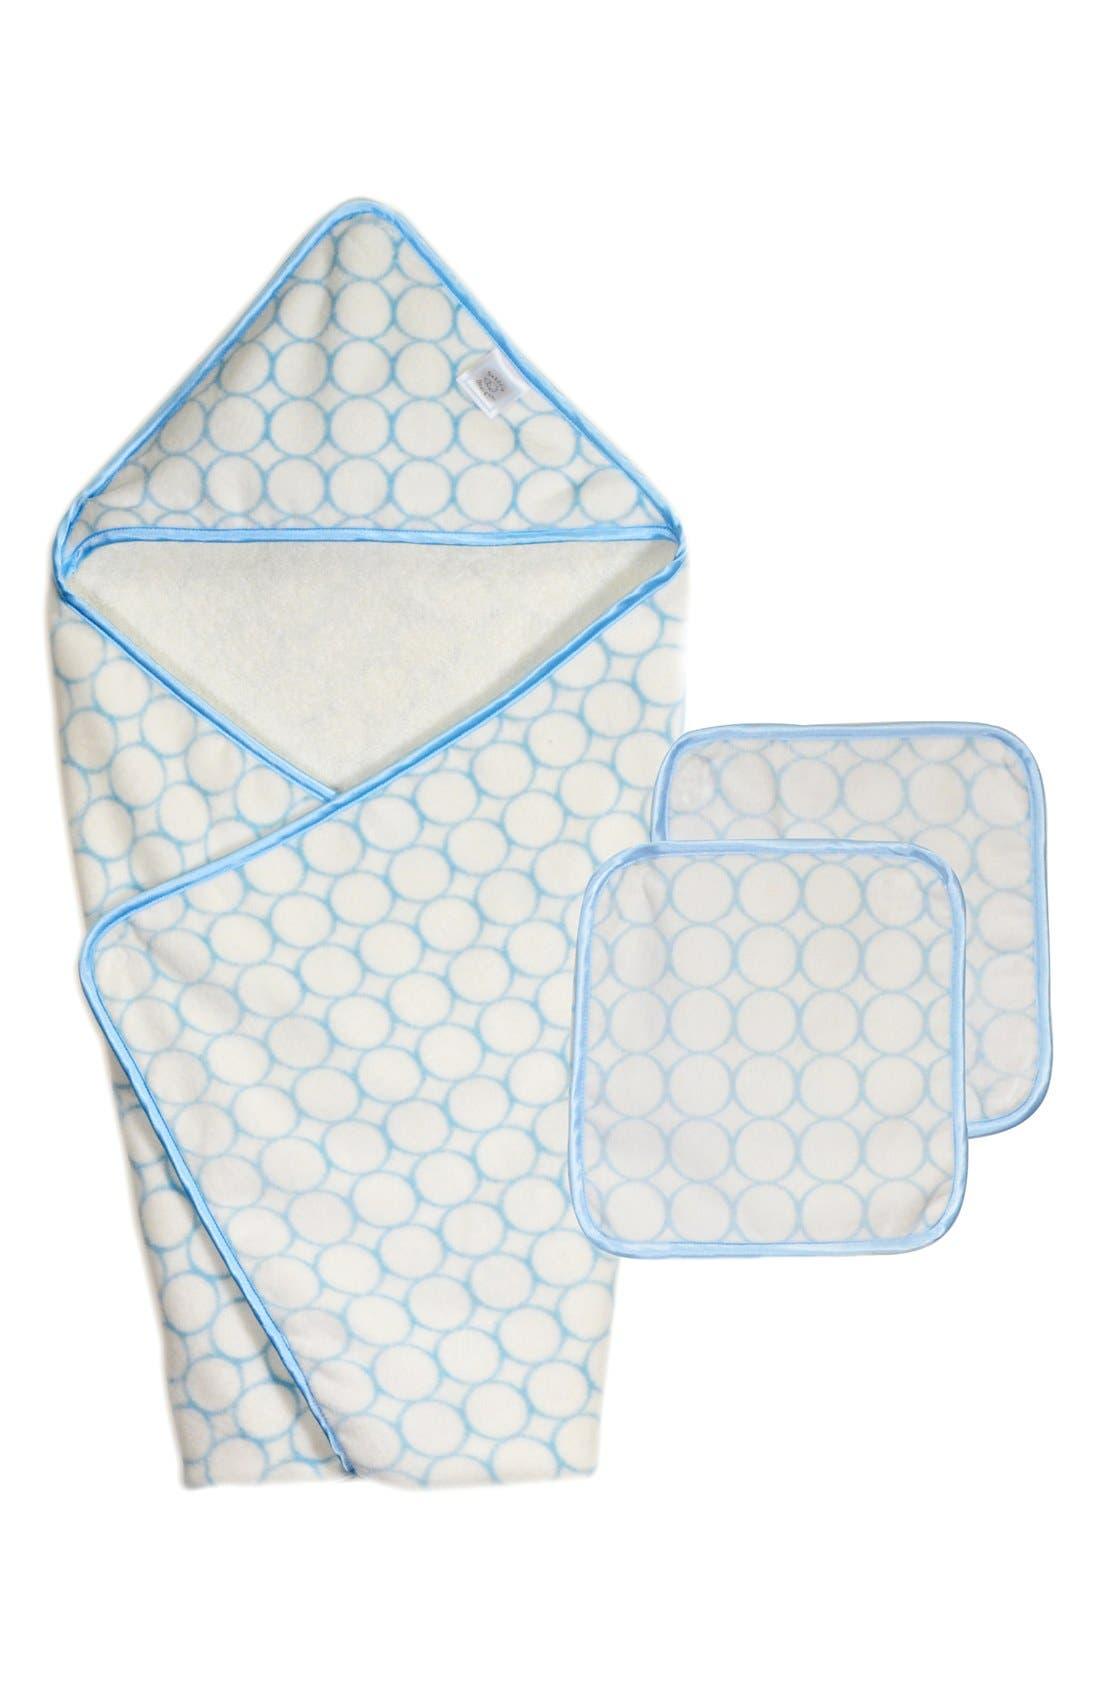 Main Image - Swaddle Designs Organic Turkish Cotton Hooded Towel & Washcloths